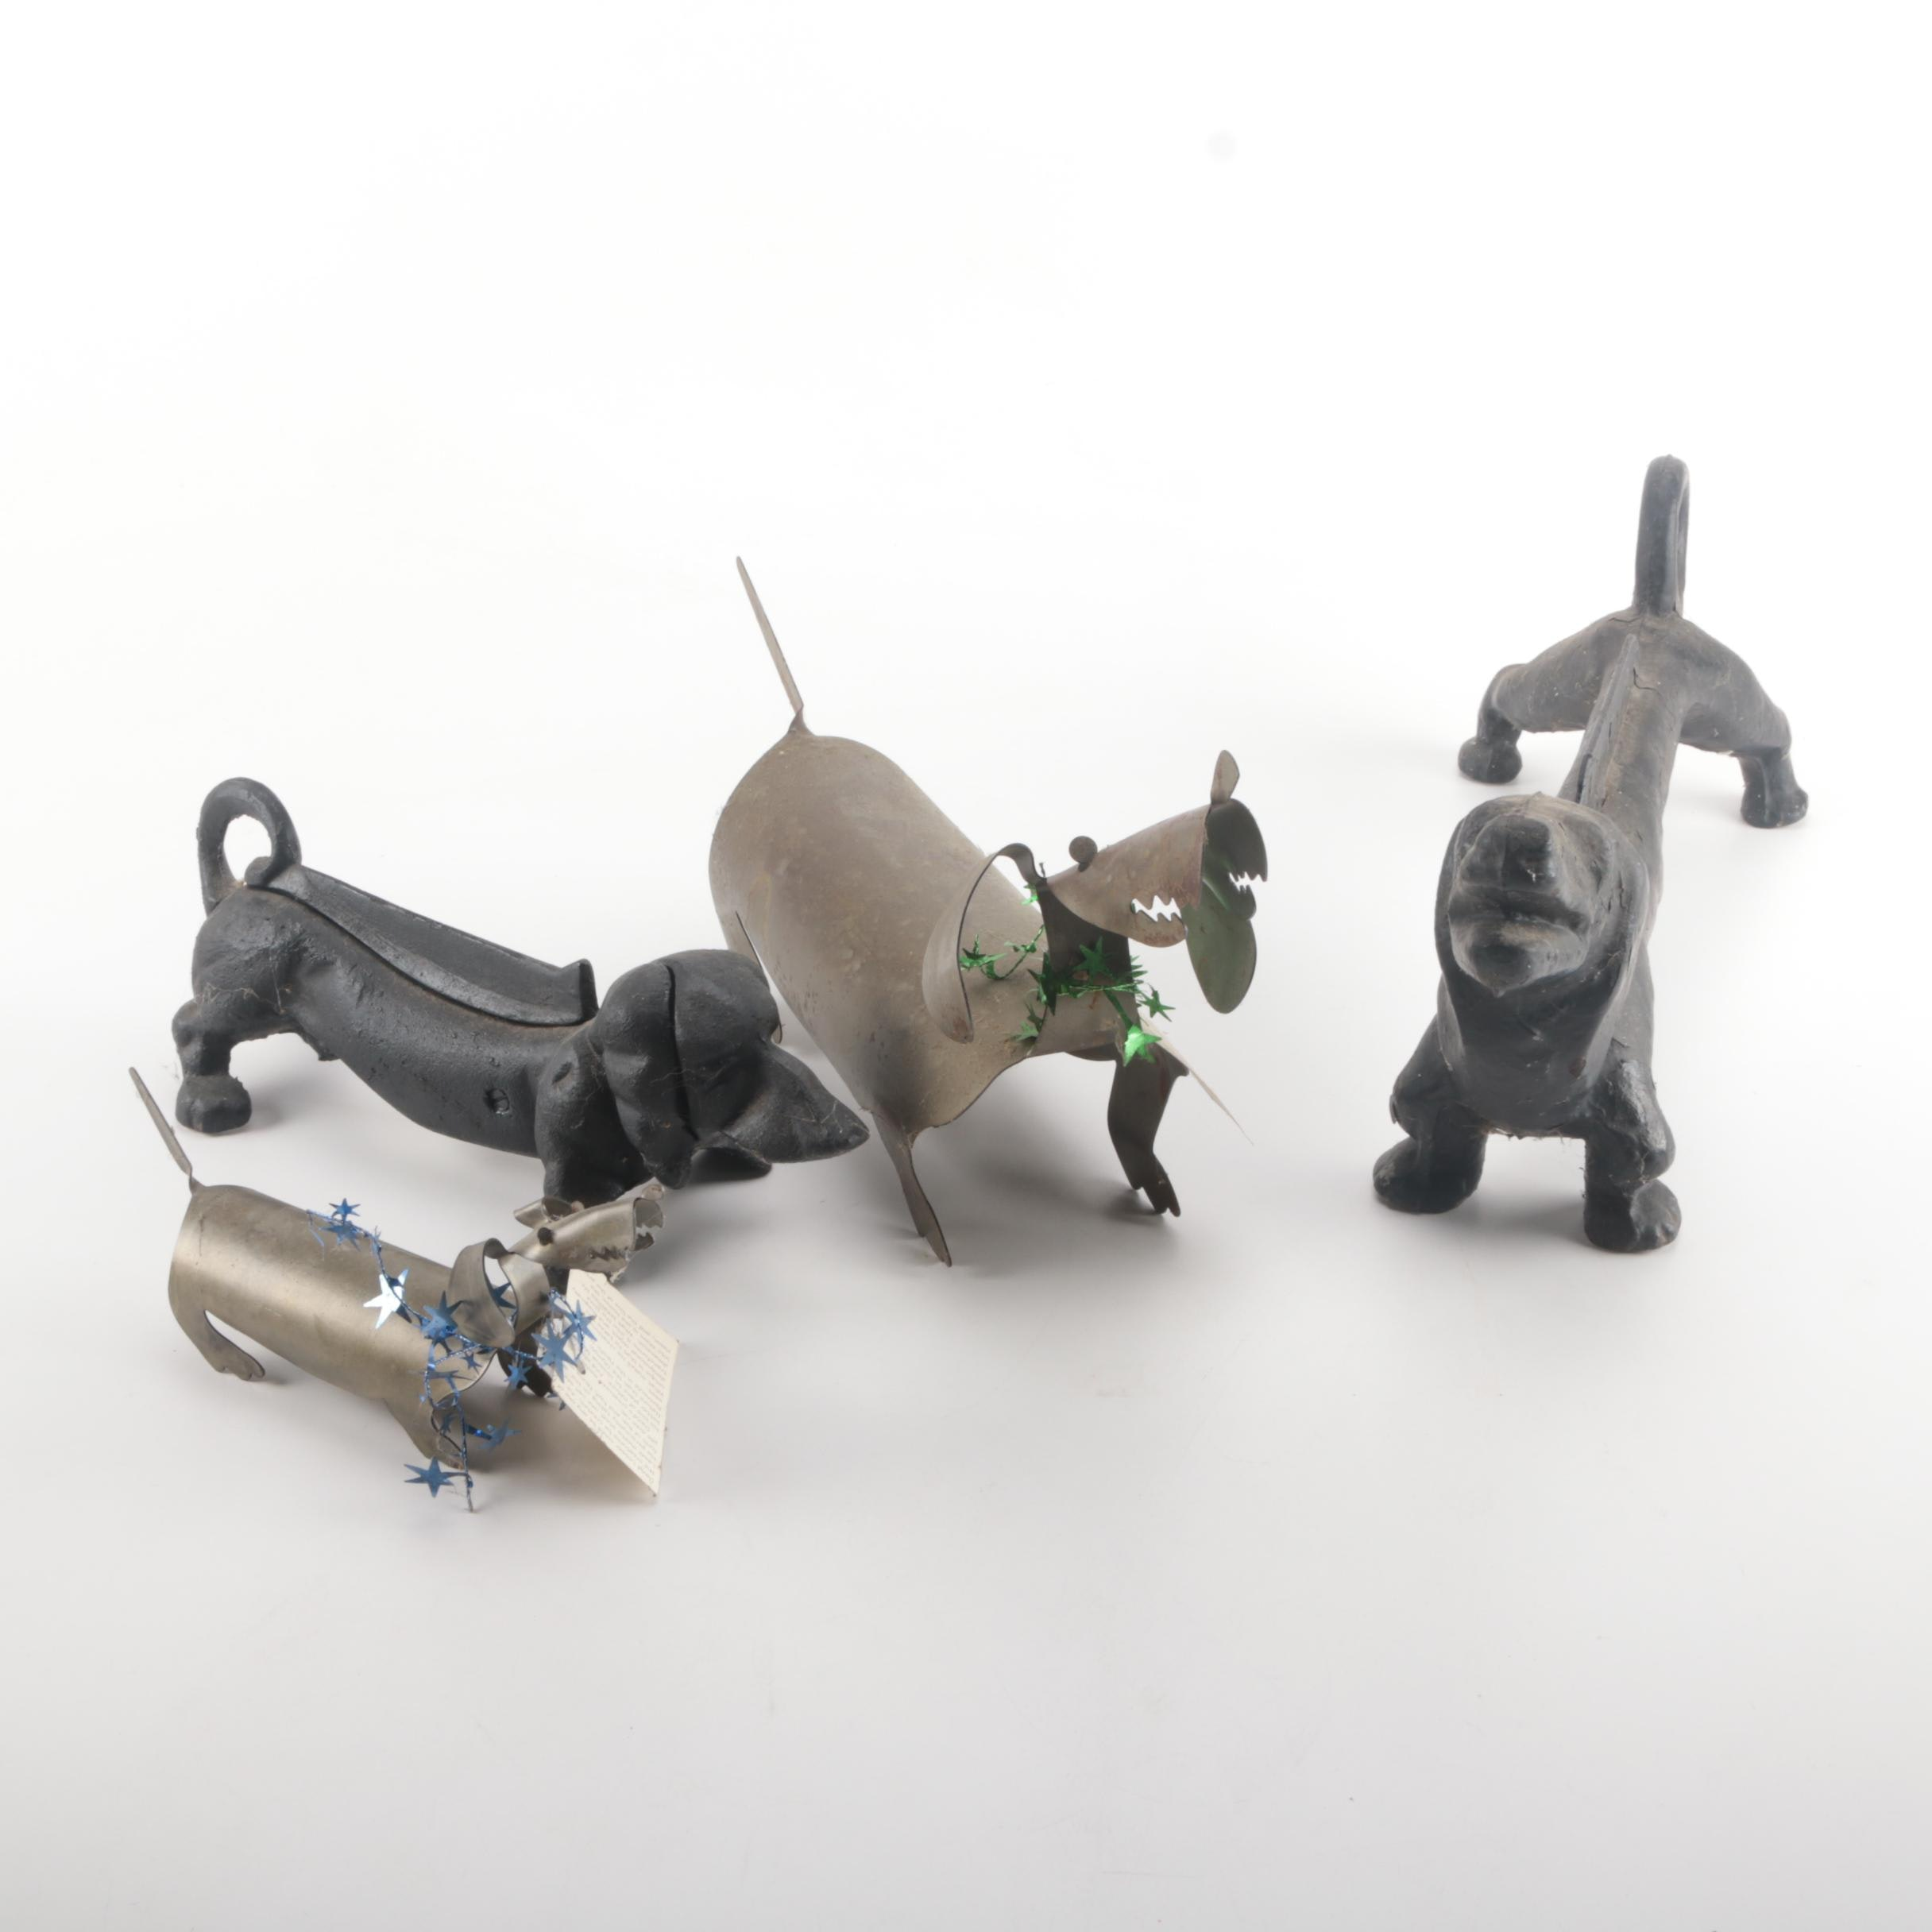 Assortment of Dachshund Figurines Featuring David Lesser